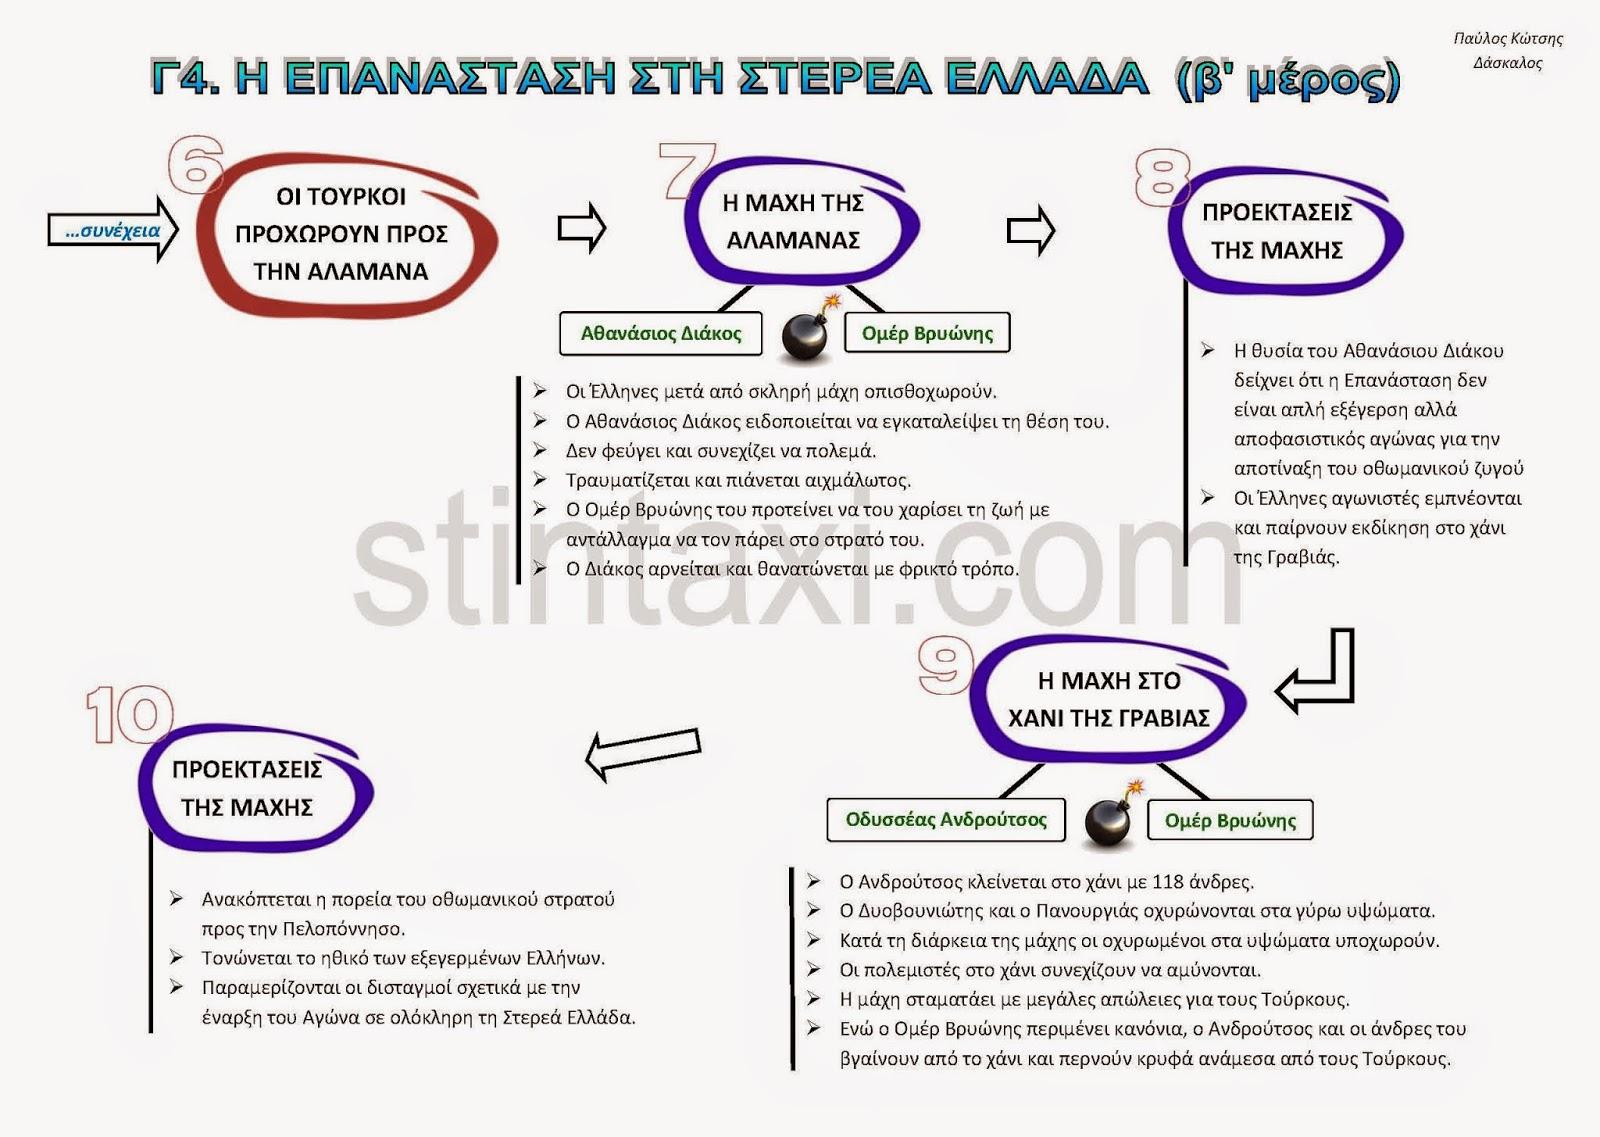 http://www.stintaxi.com/uploads/1/3/1/0/13100858/c4b-epanast-sterea-v2.1.pdf